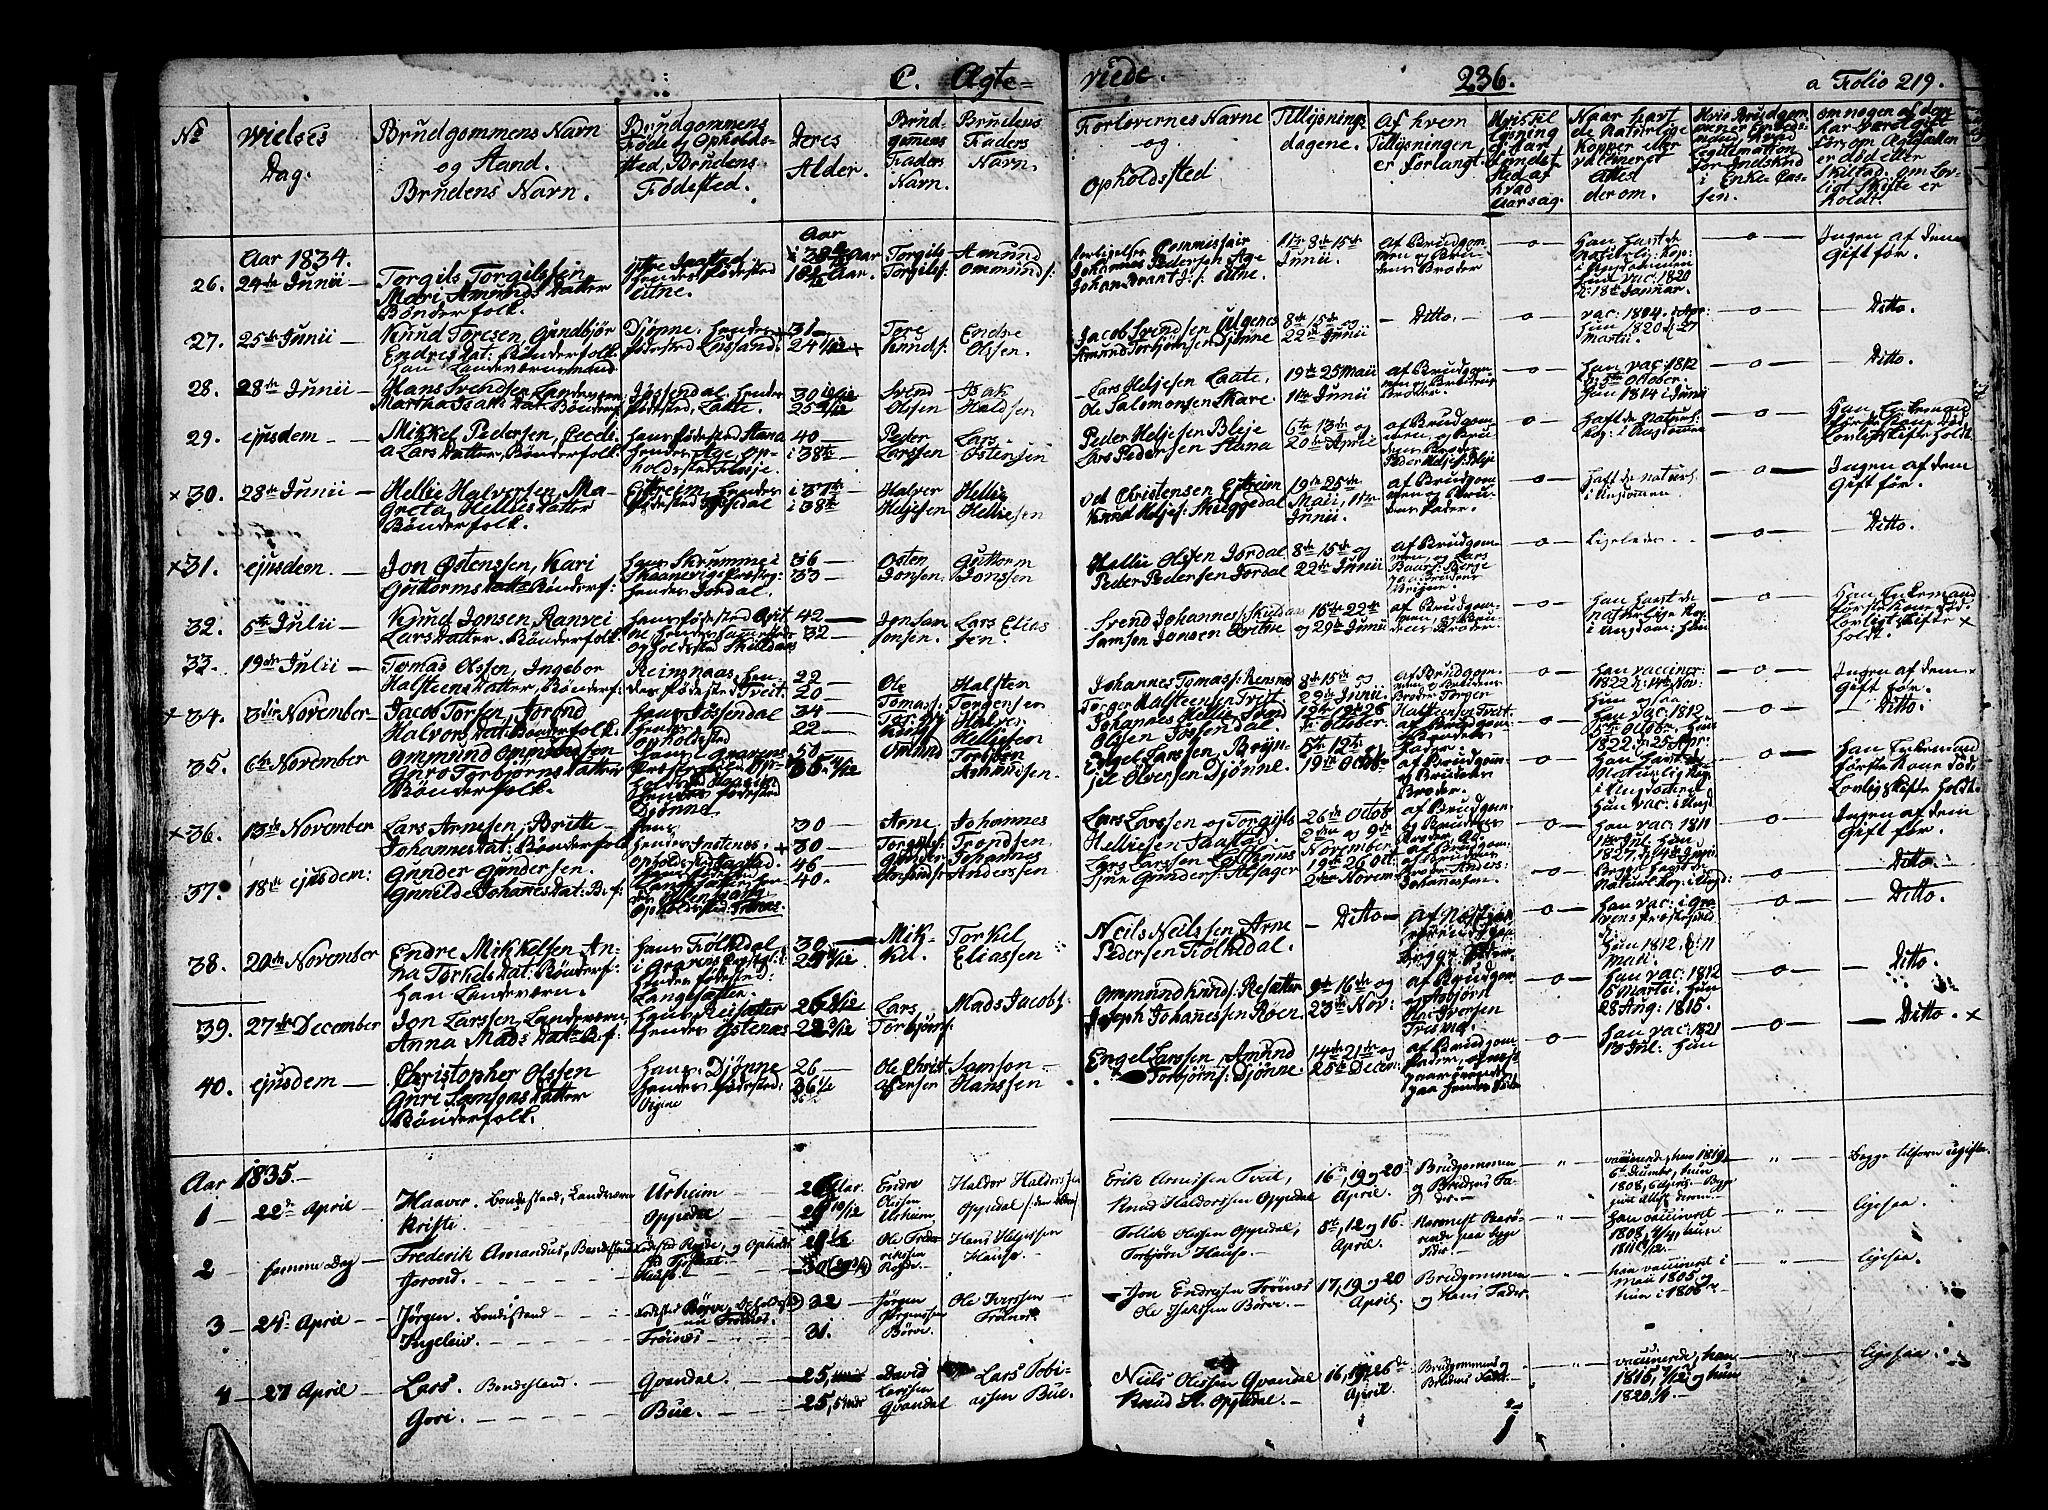 SAB, Ullensvang Sokneprestembete, H/Haa: Ministerialbok nr. A 10, 1825-1853, s. 236